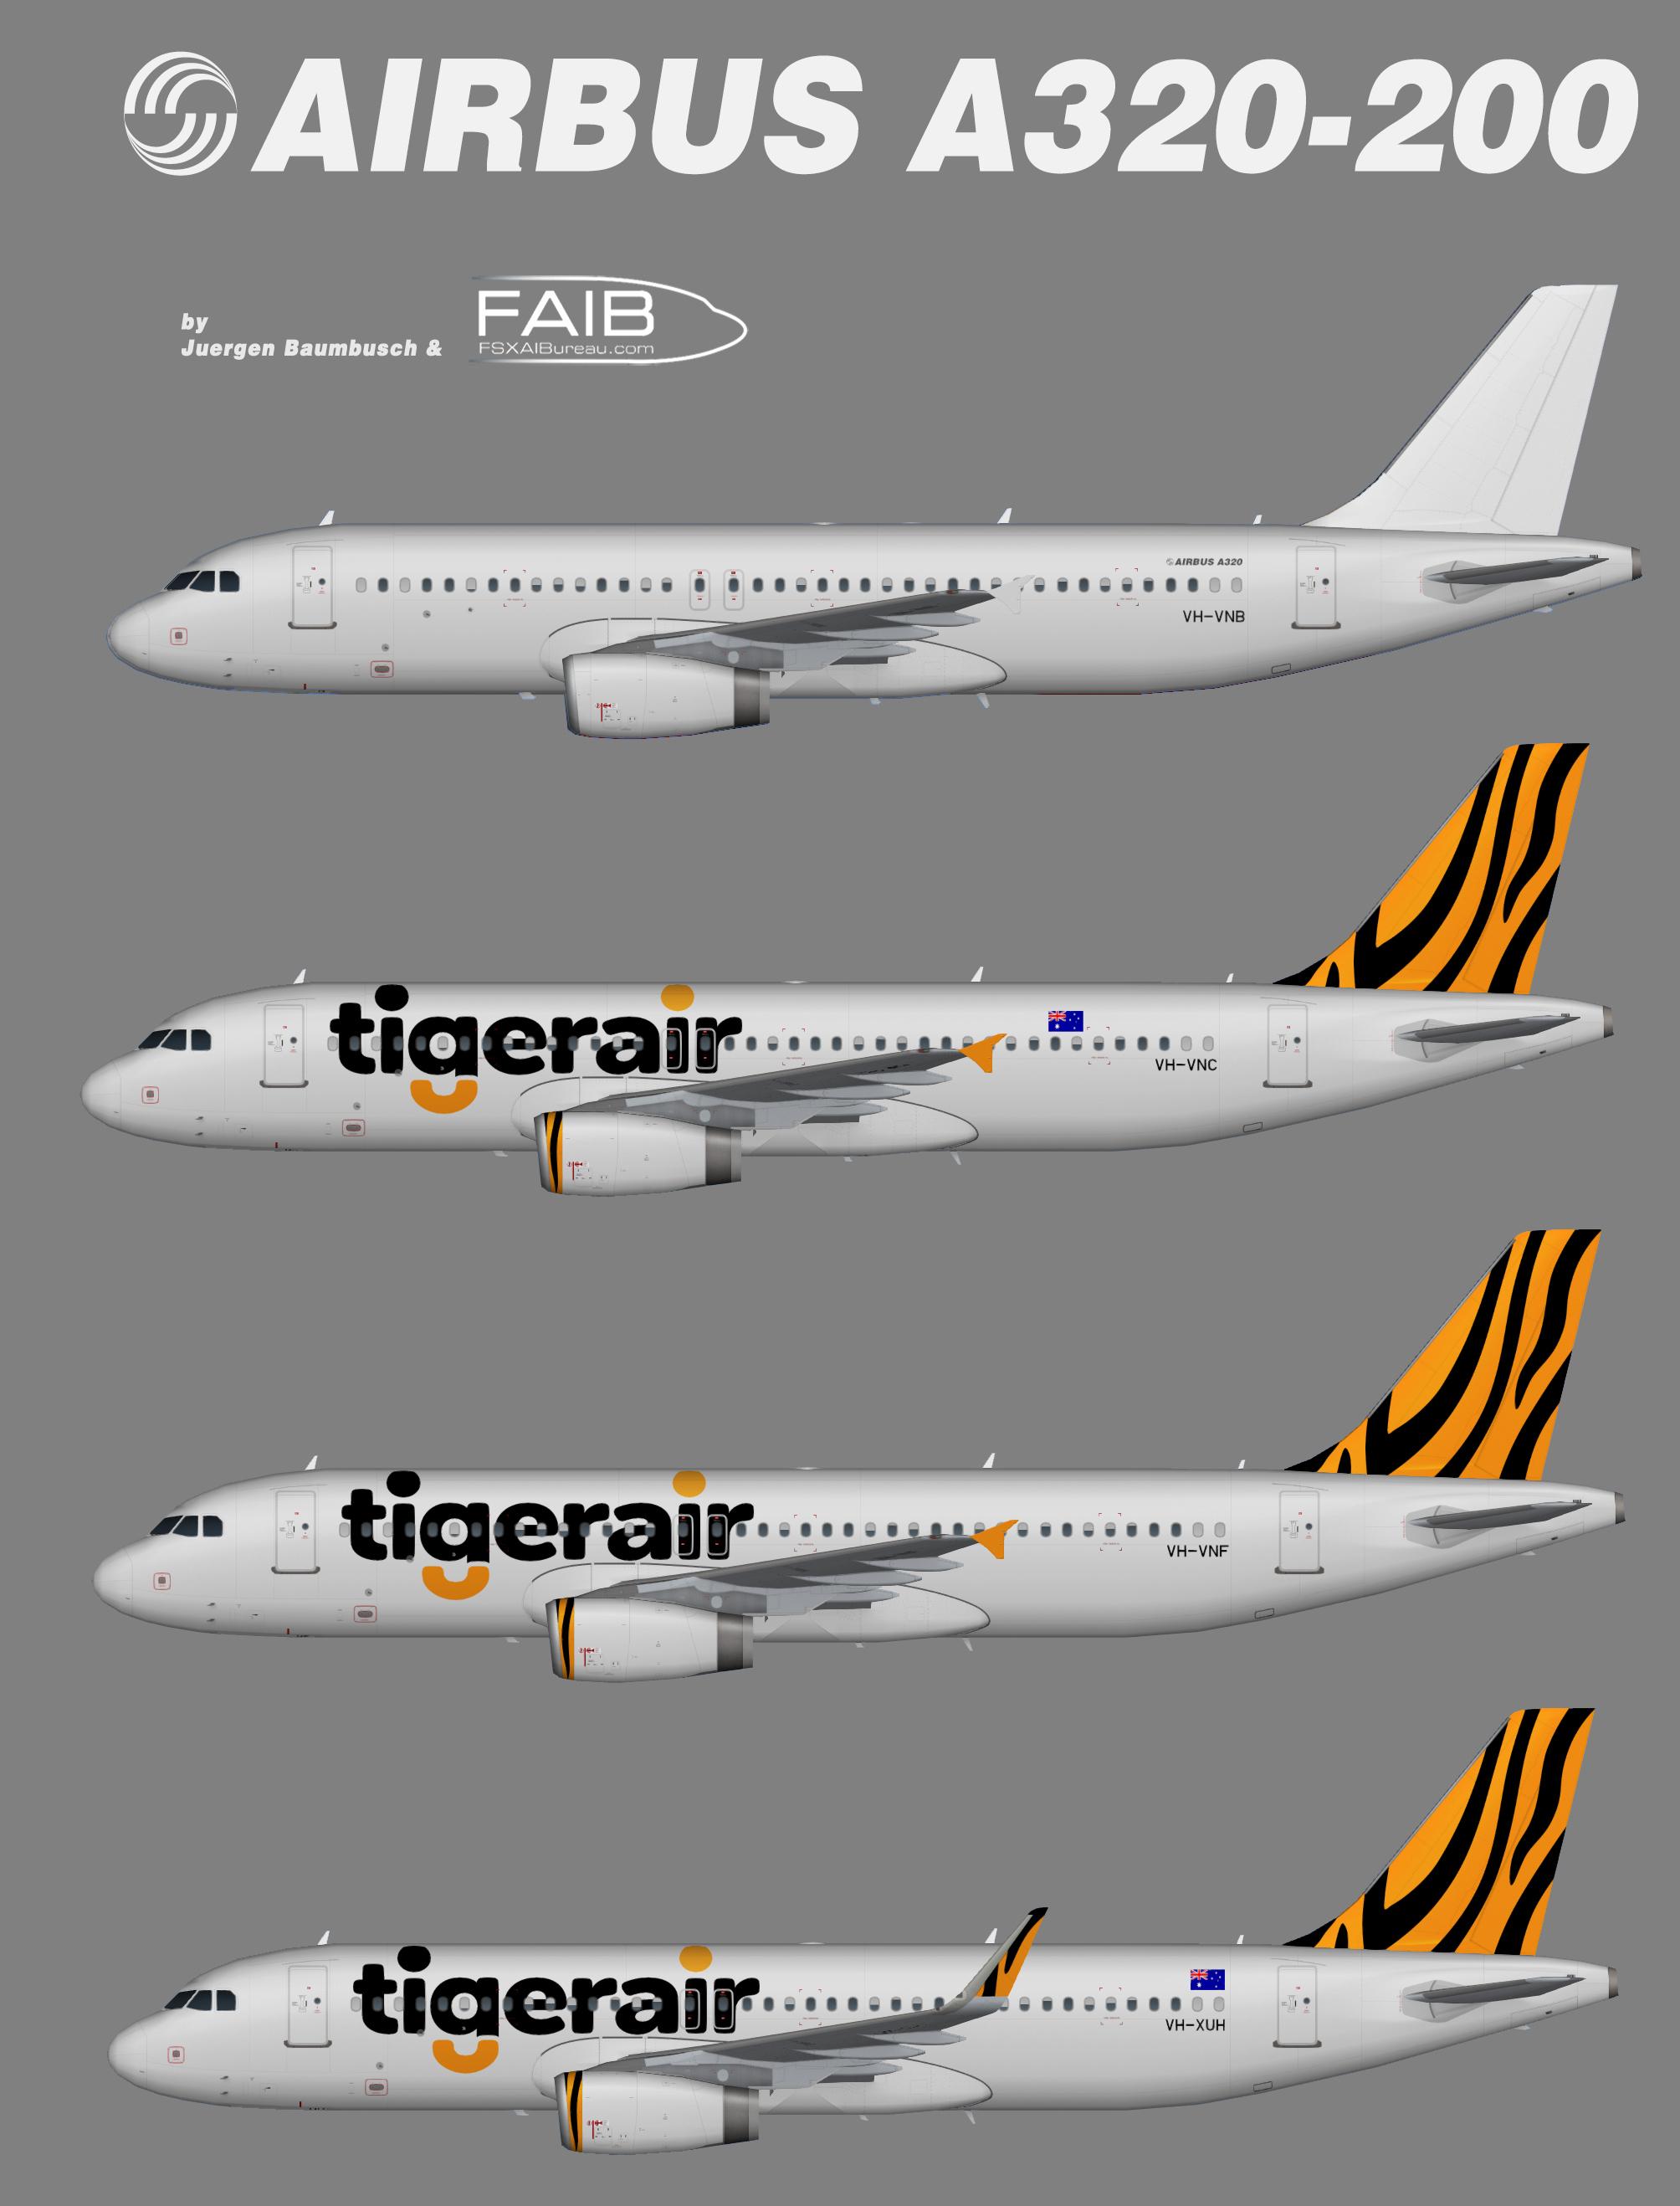 Tigerair Australia NC